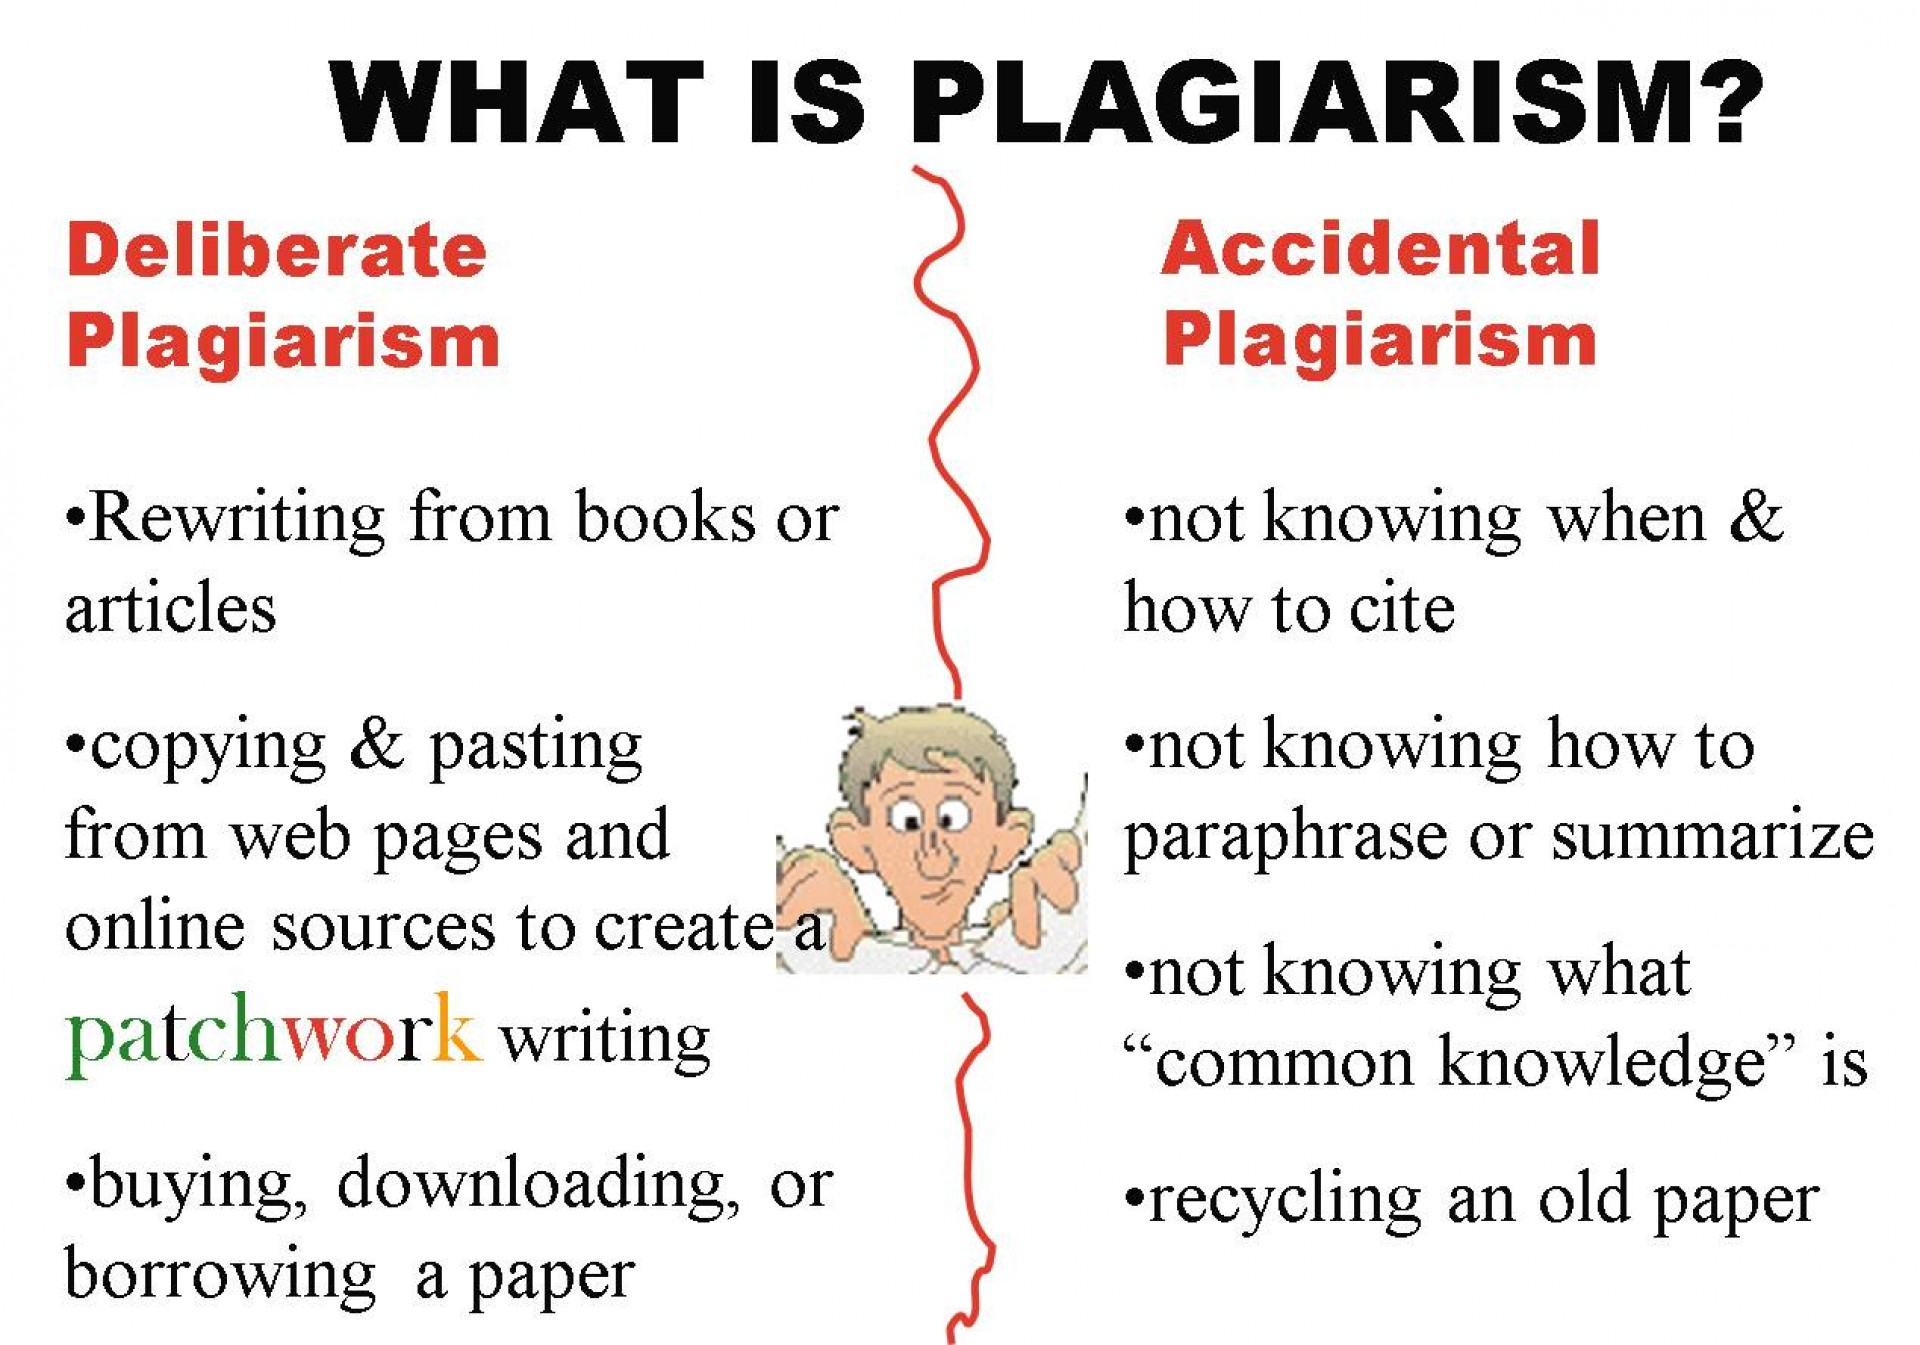 004 Whatisplagiarism 3506343 Essay Example Shocking Plagiarism Checker Free Turnitin Sample 1920